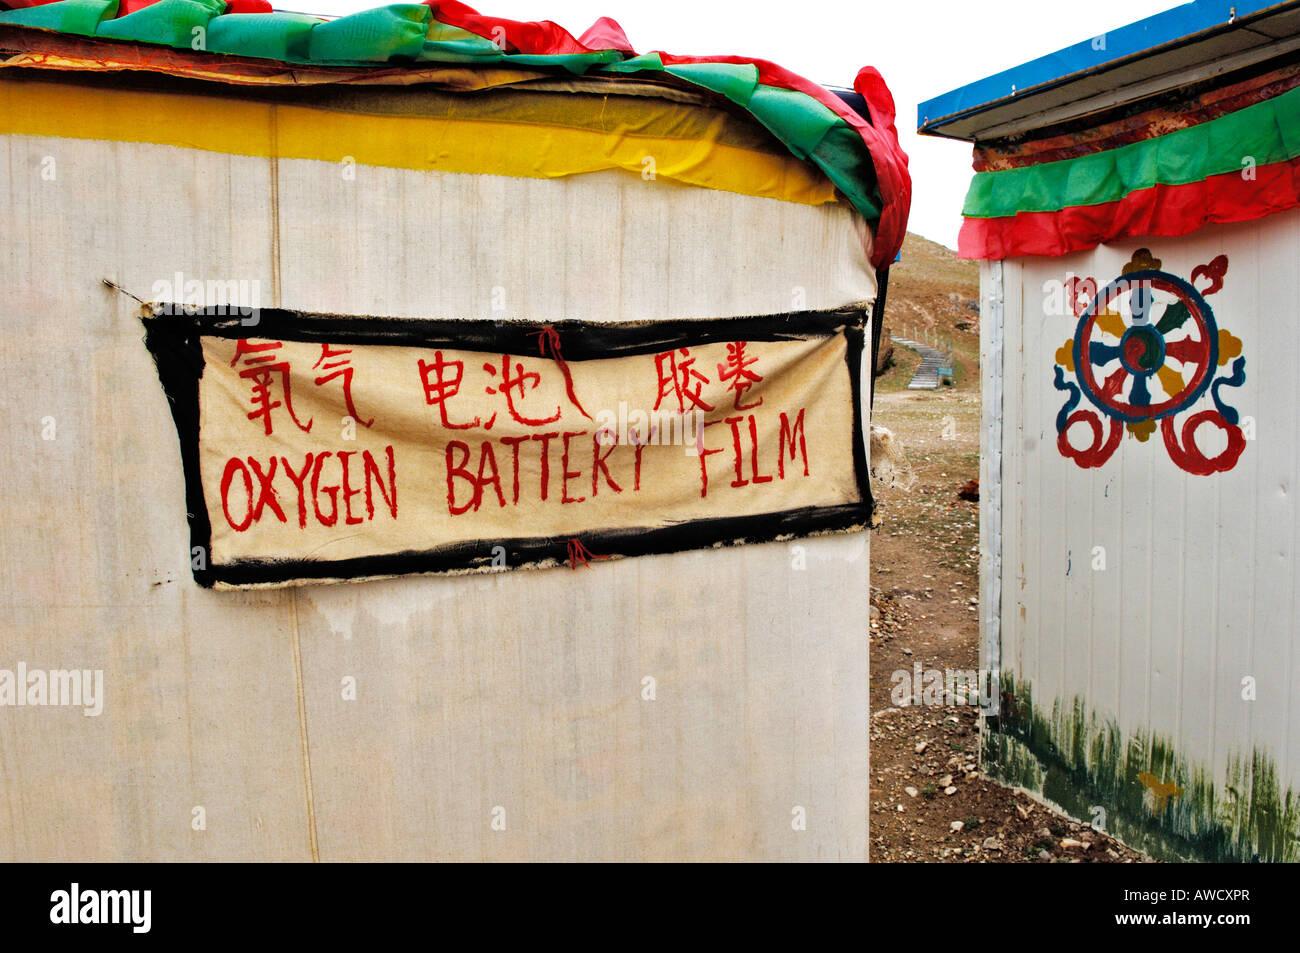 Offerta batteria ossigeno film, Nam Tso lake, Tibet Immagini Stock